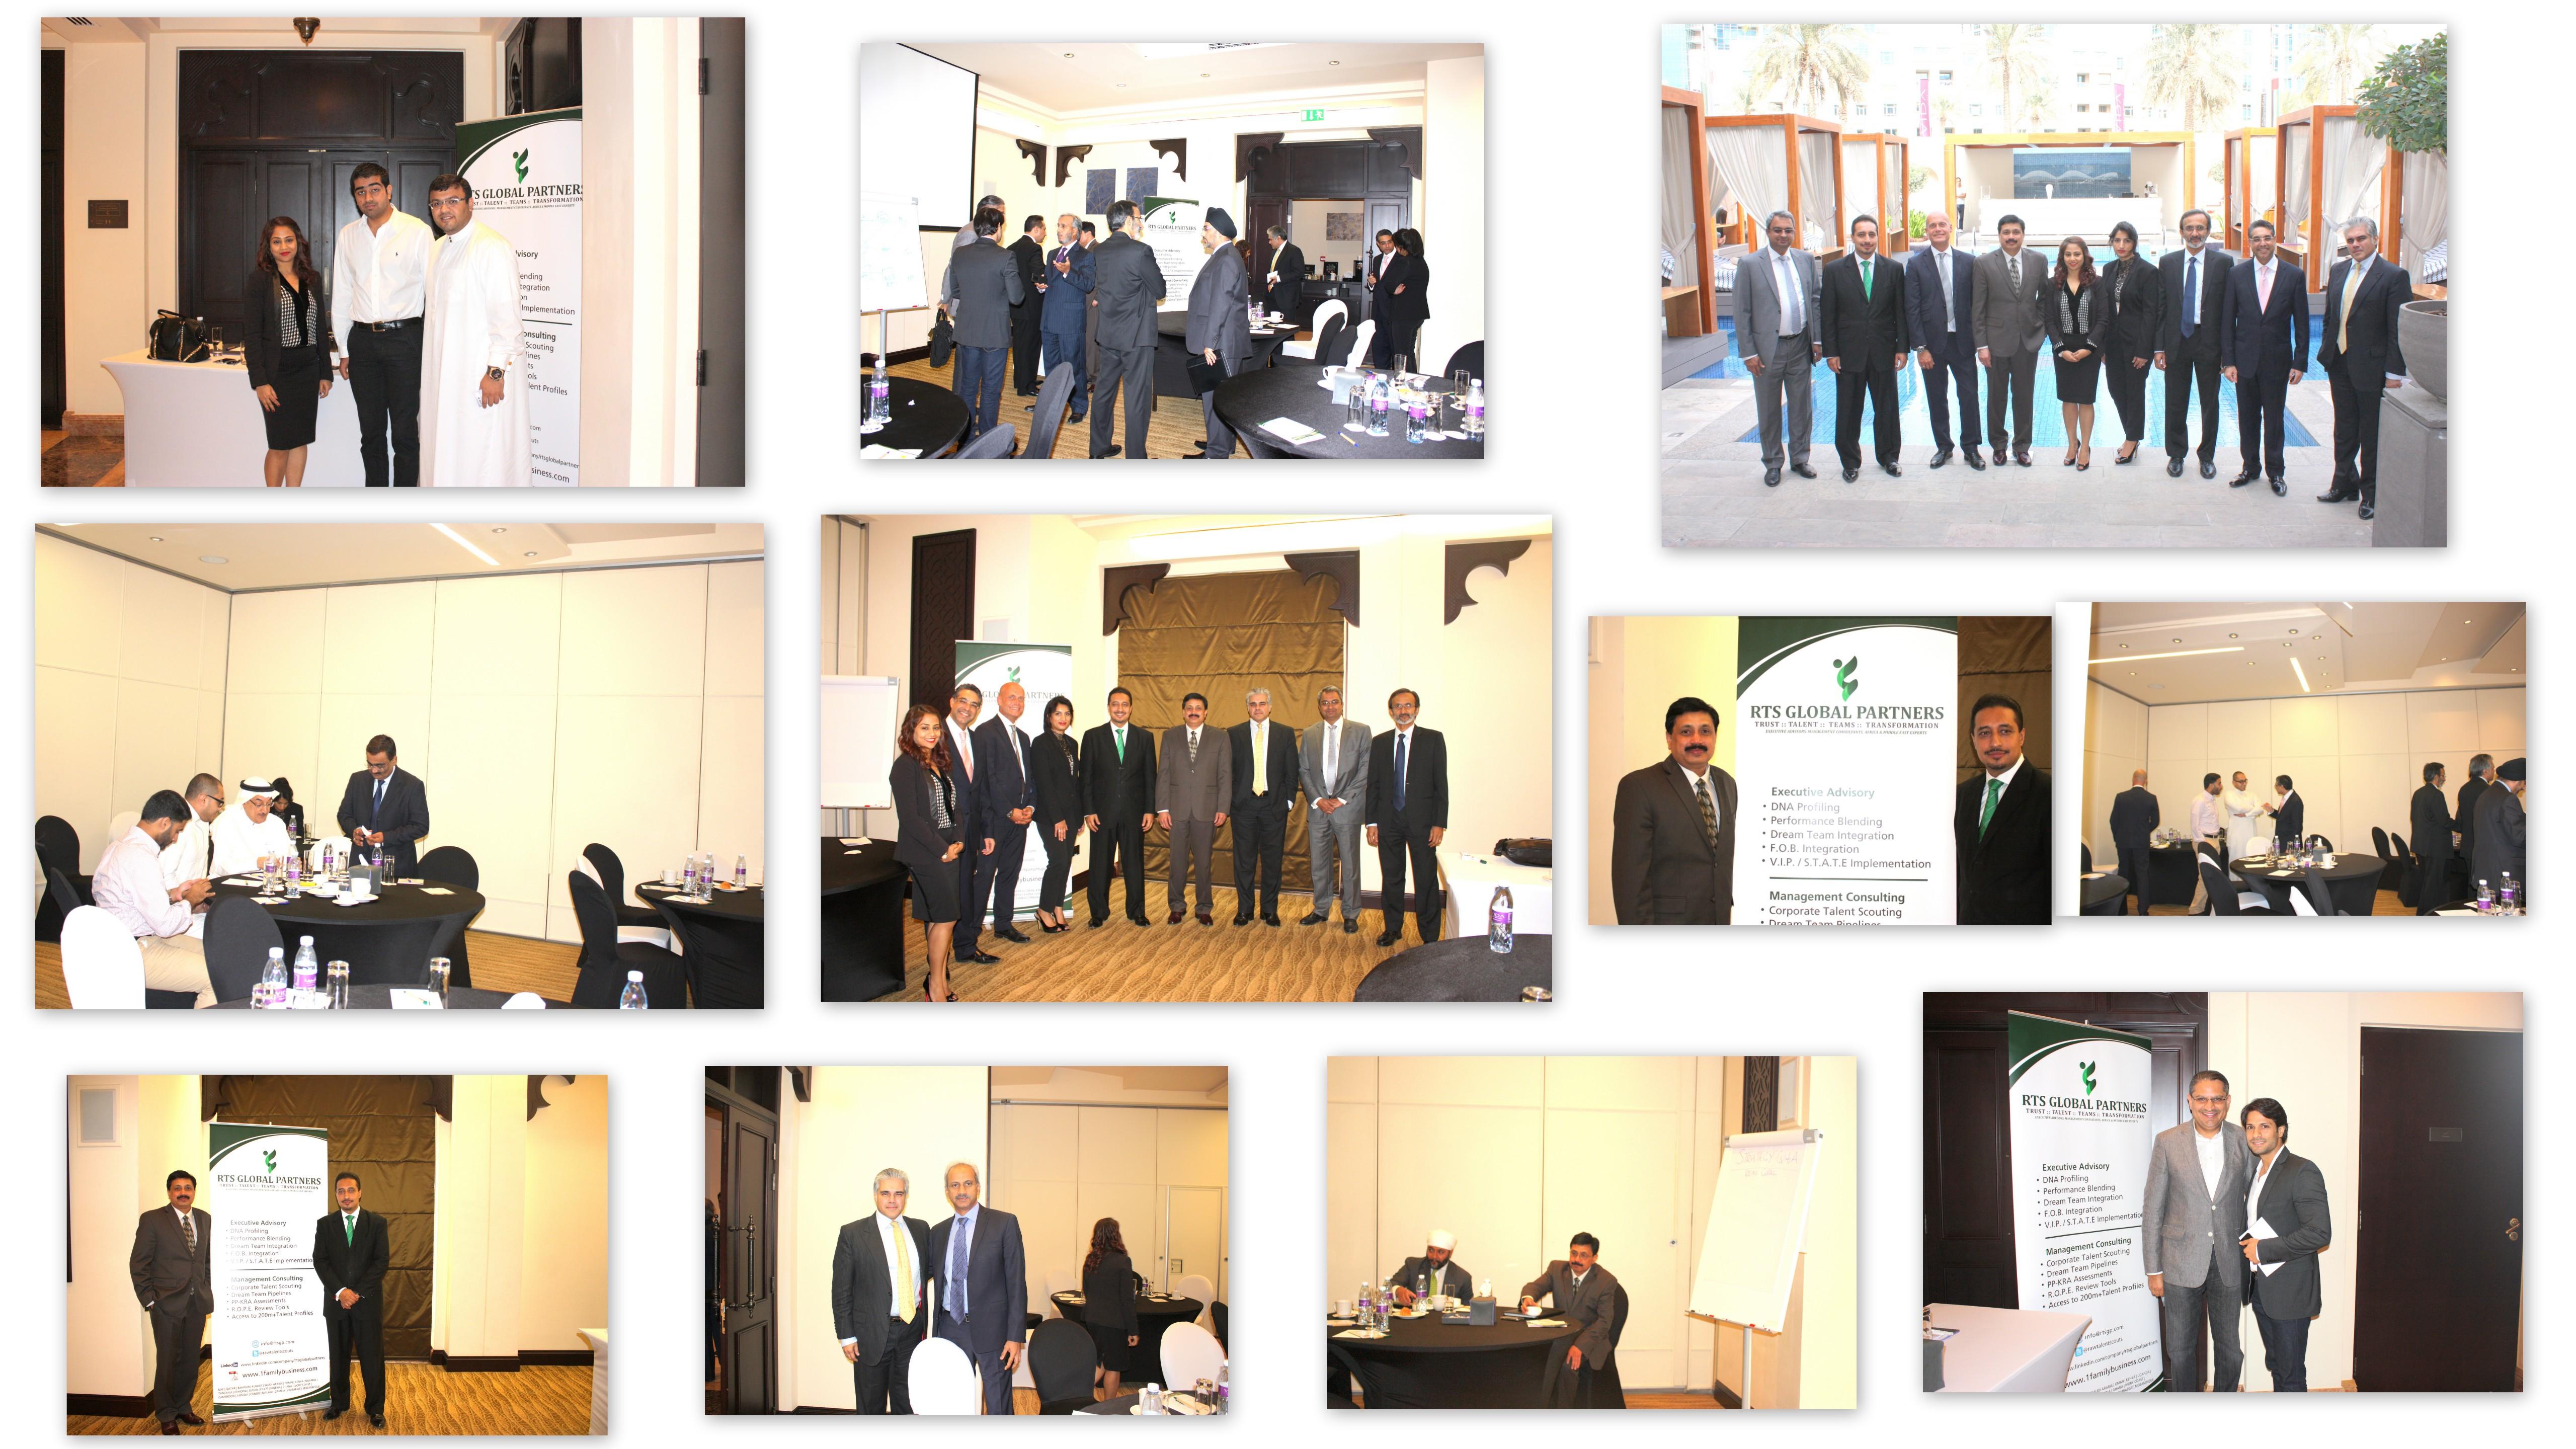 RTS Executive Forum - 17th Nov 2014